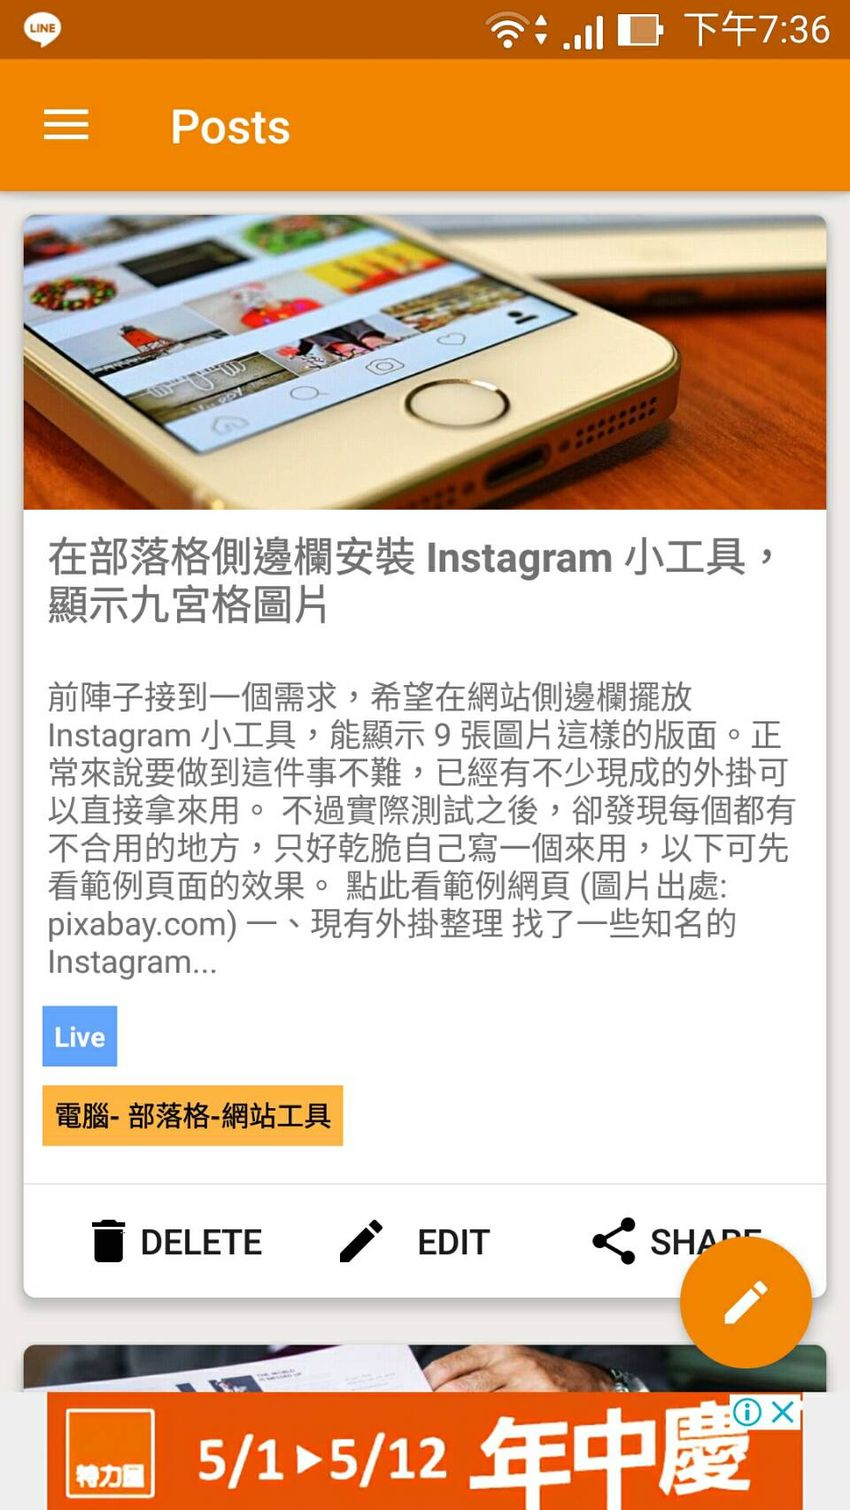 blogger-android-app-publish-post-2.jpg-Blogger 可以在行動裝置發佈文章+上傳圖片的 APP 整理